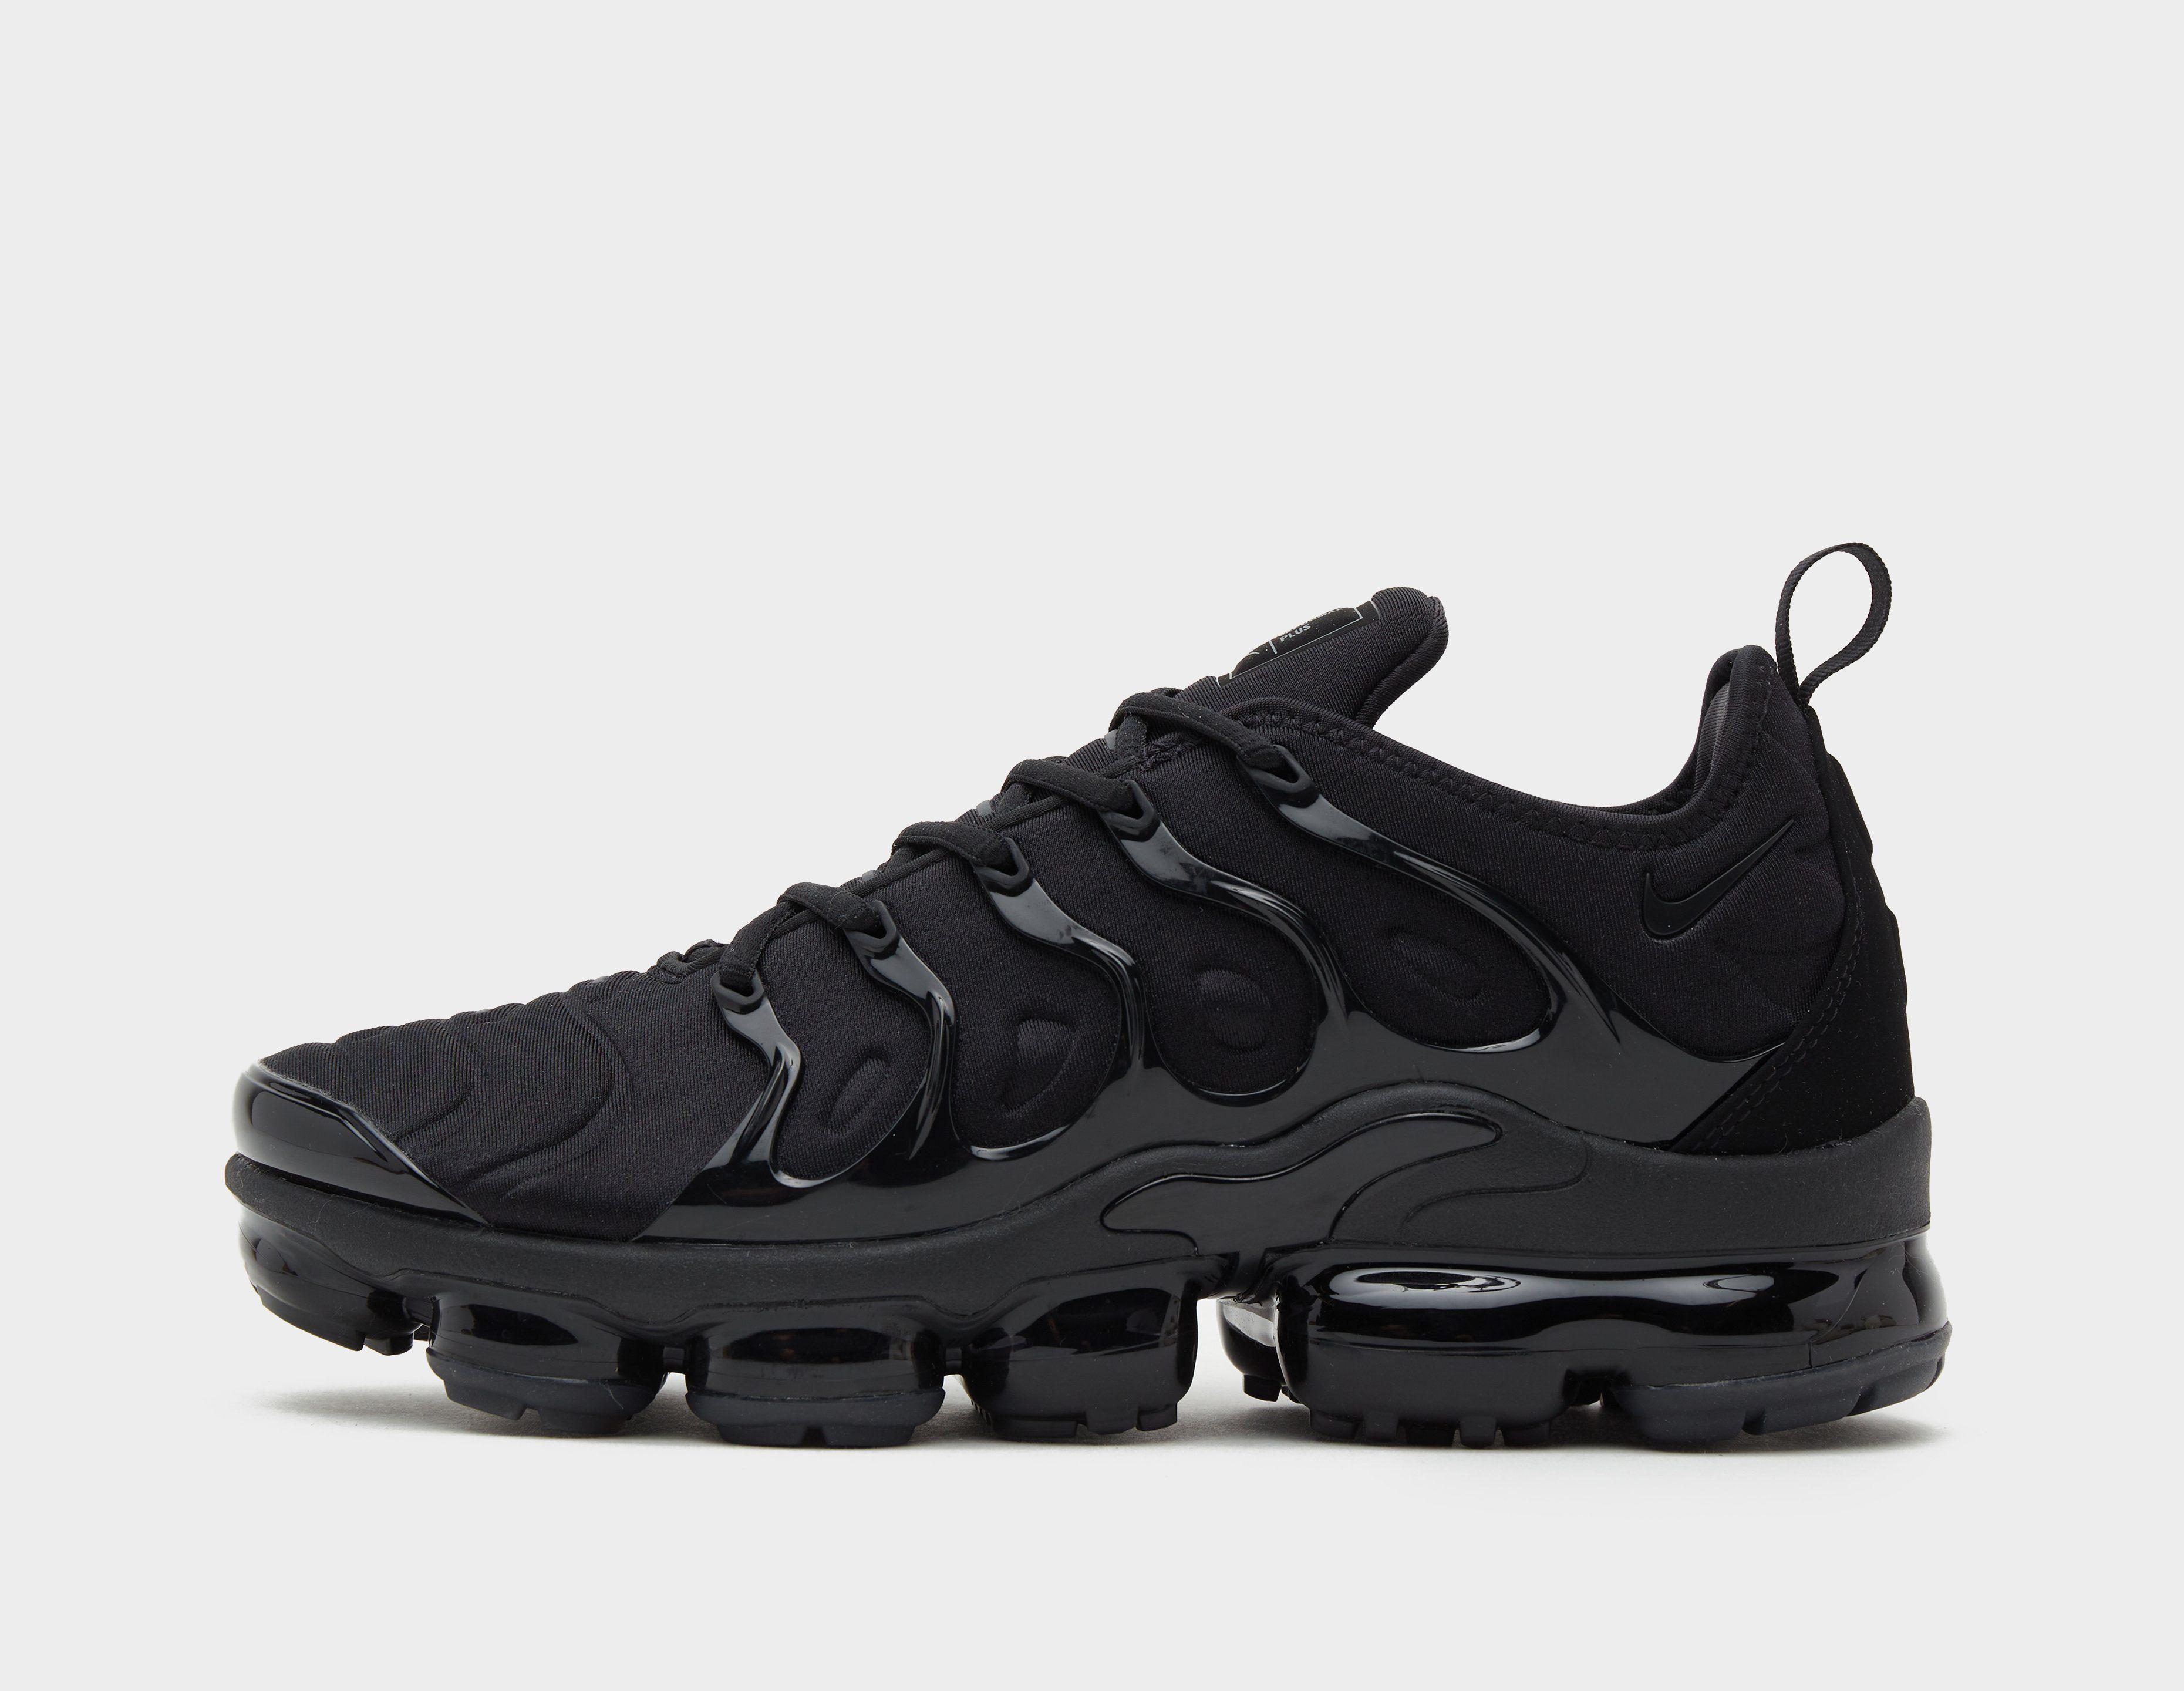 0c2beddb109 Nike Air VaporMax Plus .